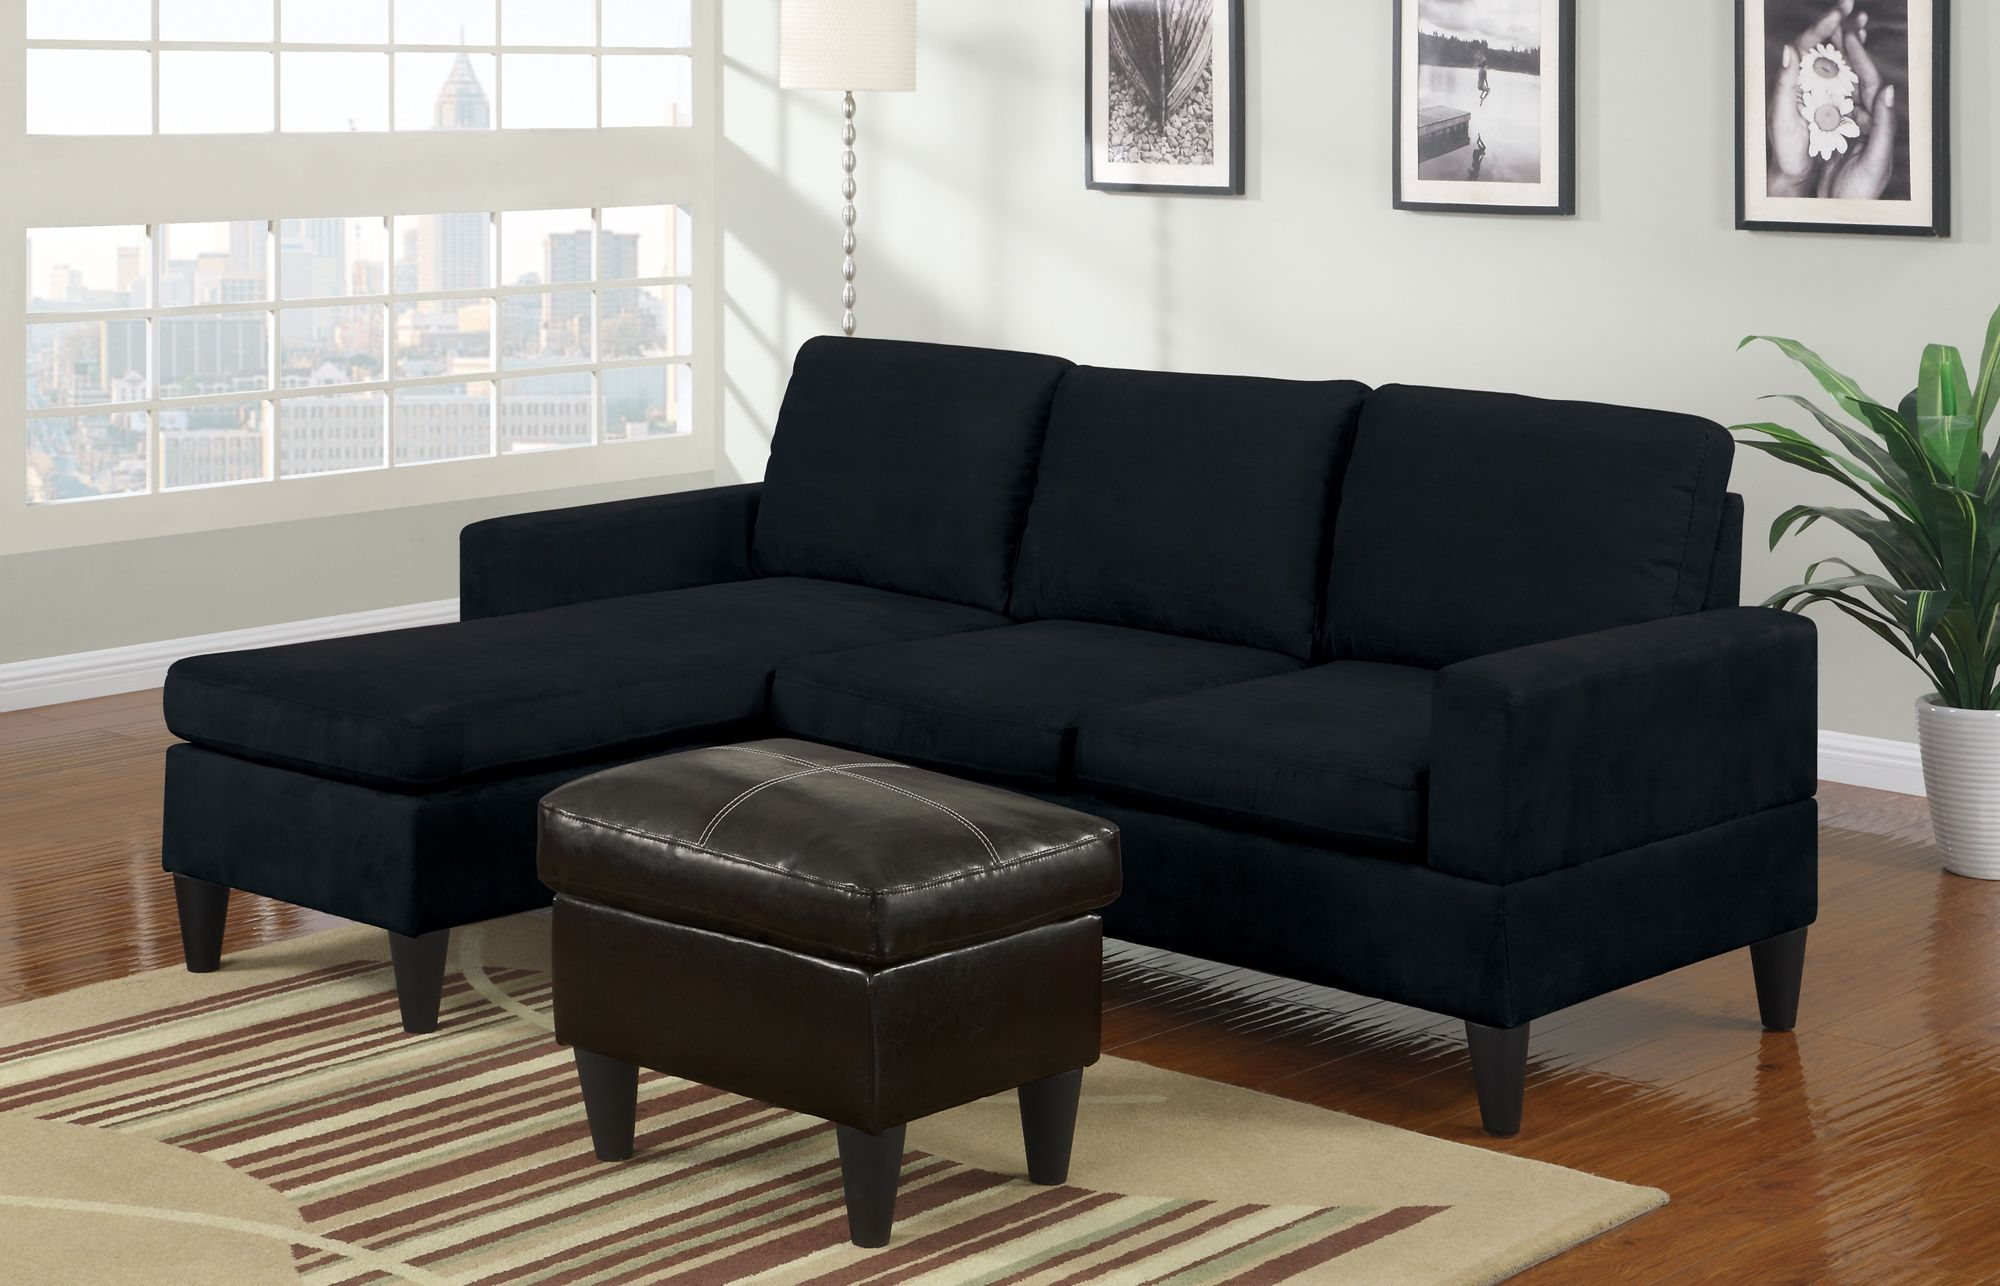 Small Black Microfiber Sectional Sofa | Apartment | Small ...